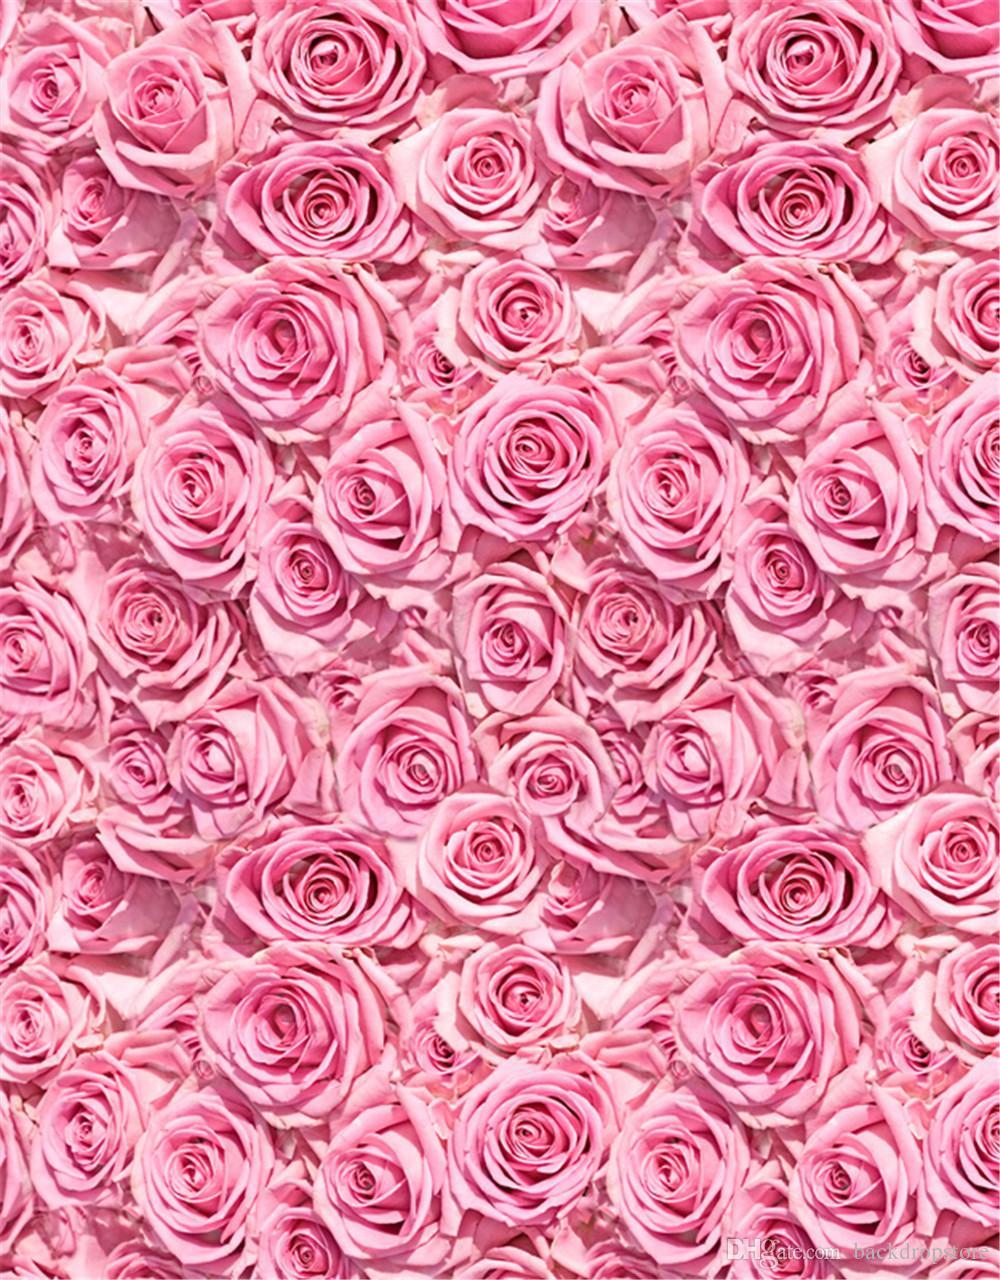 2018 Digital Printed Pink Rose 3D Backgrounds Baby Newborn